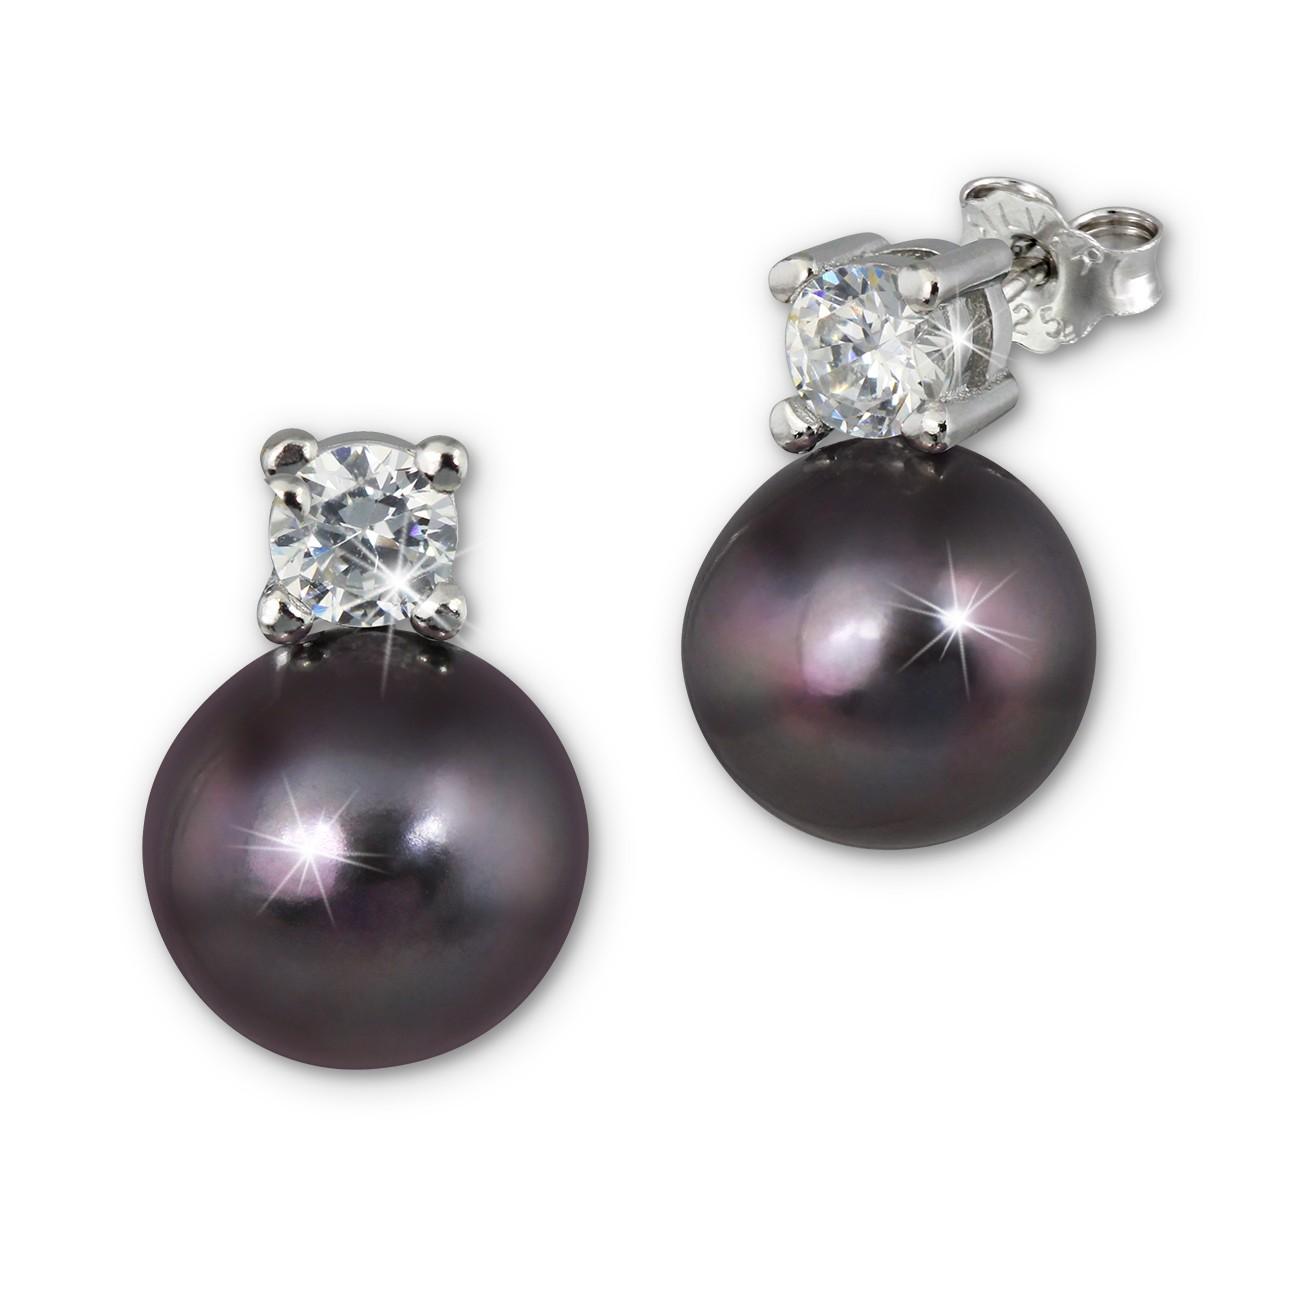 SilberDream Ohrstecker Perle schwarz Zirkonia Damen 925er Silber SDO1738S